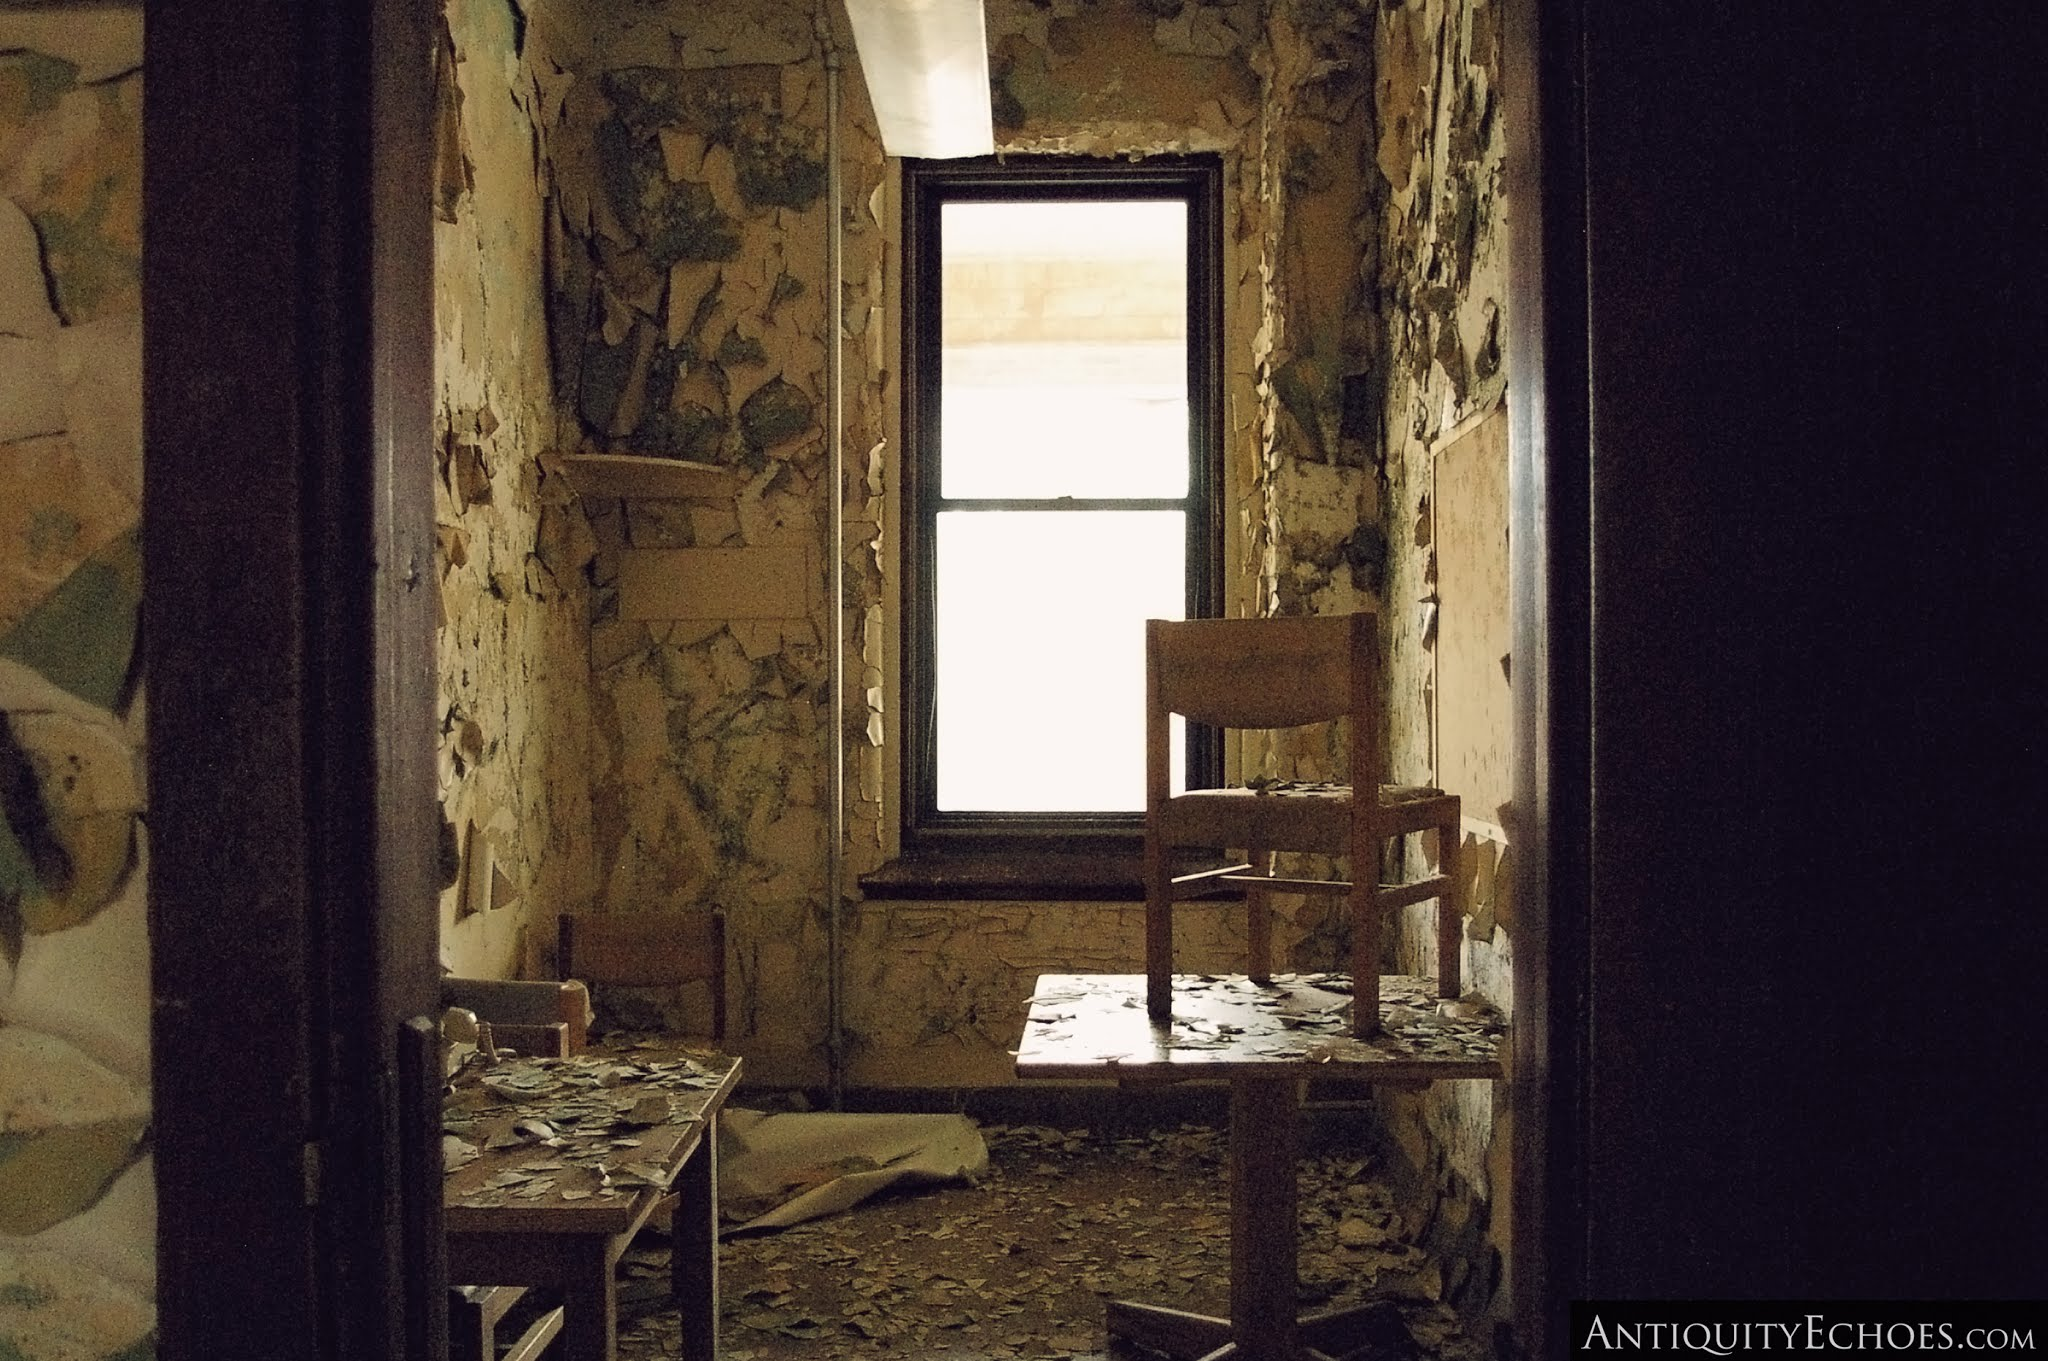 Overbrook Asylum - Employee Break Room